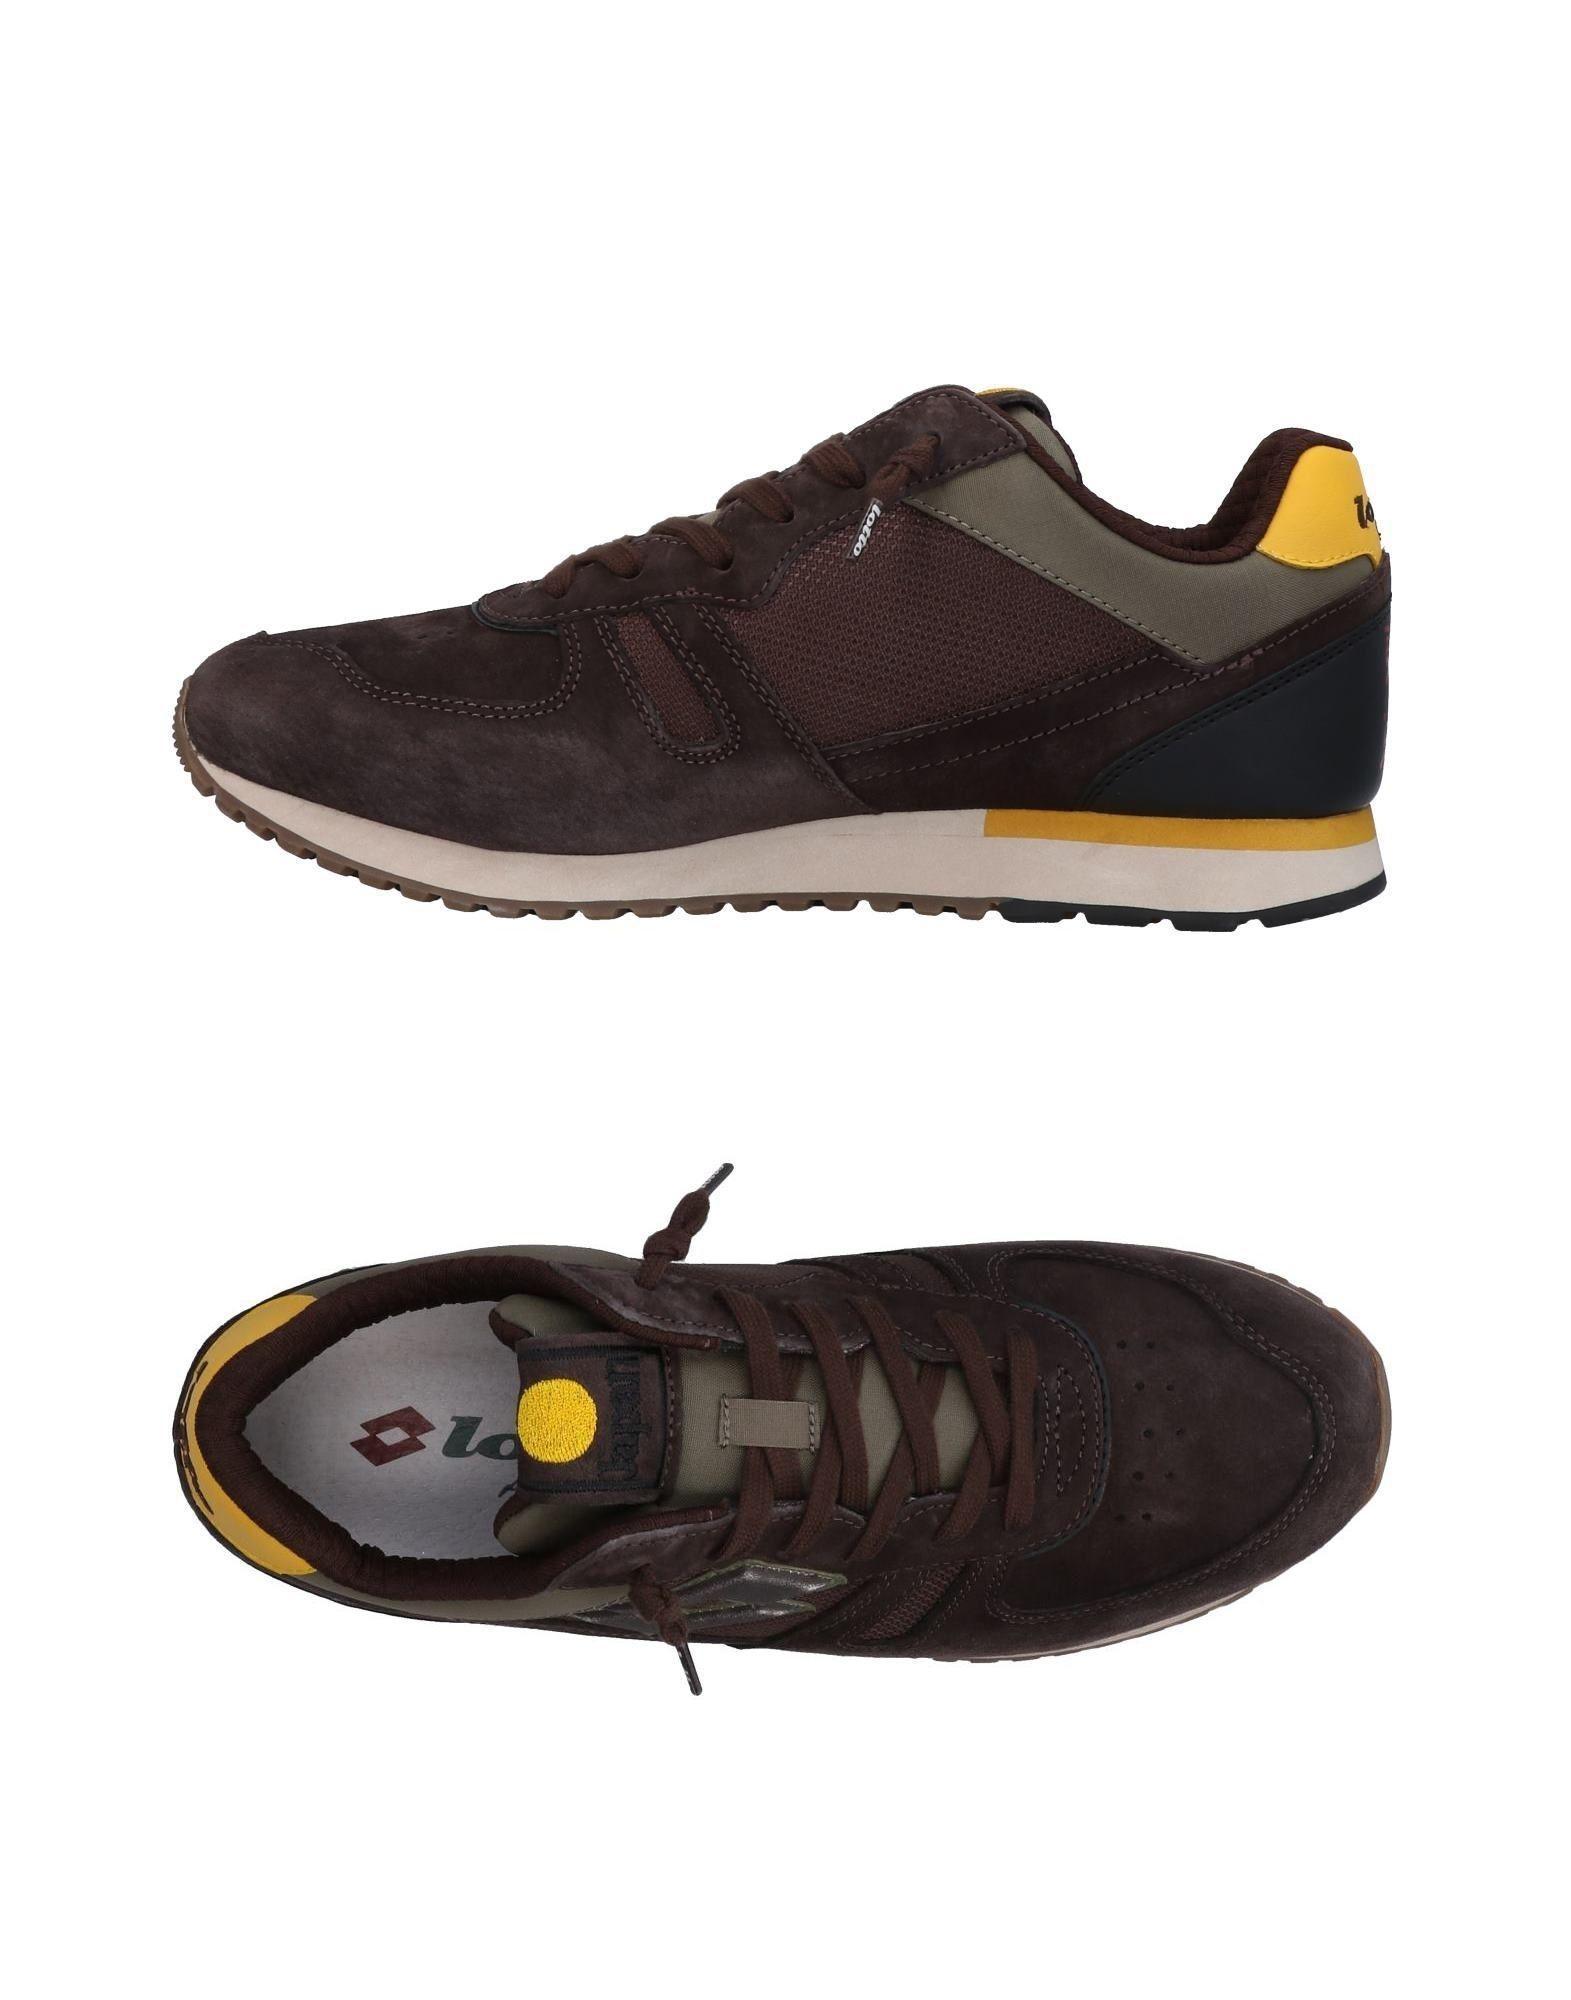 Lotto Leggenda Sneakers In Dark Brown